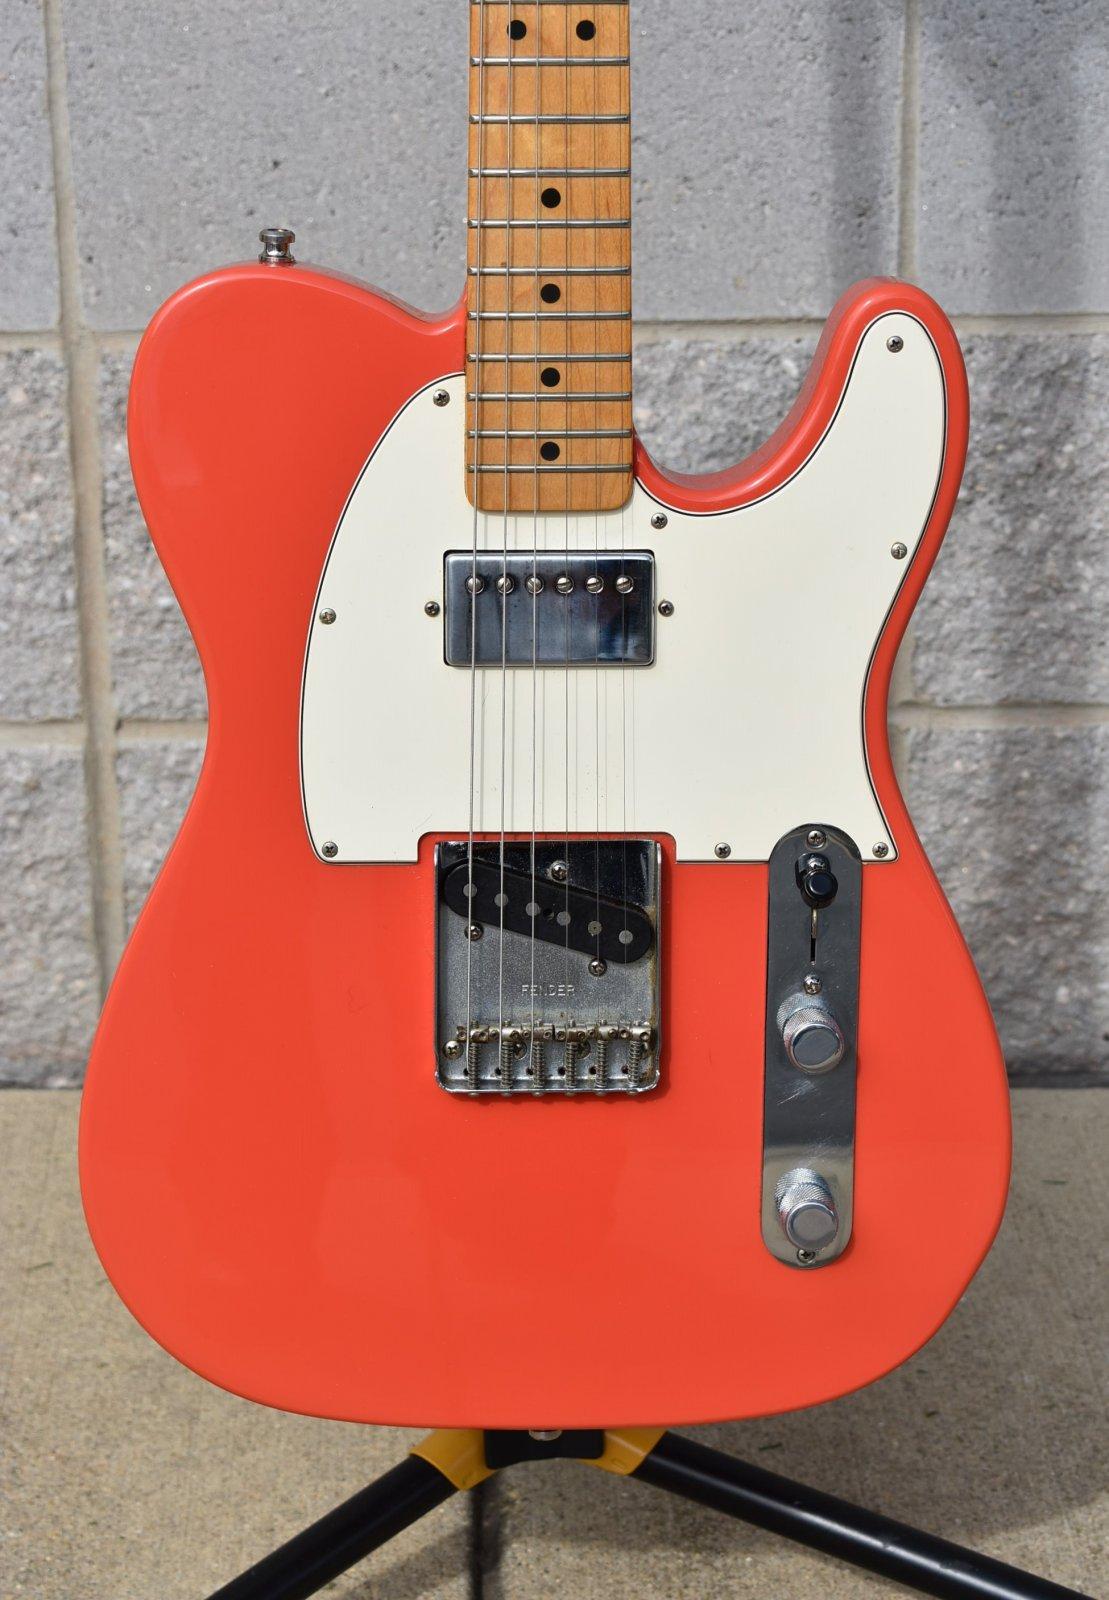 1997 Fender California Fat Telecaster - Fiesta Red